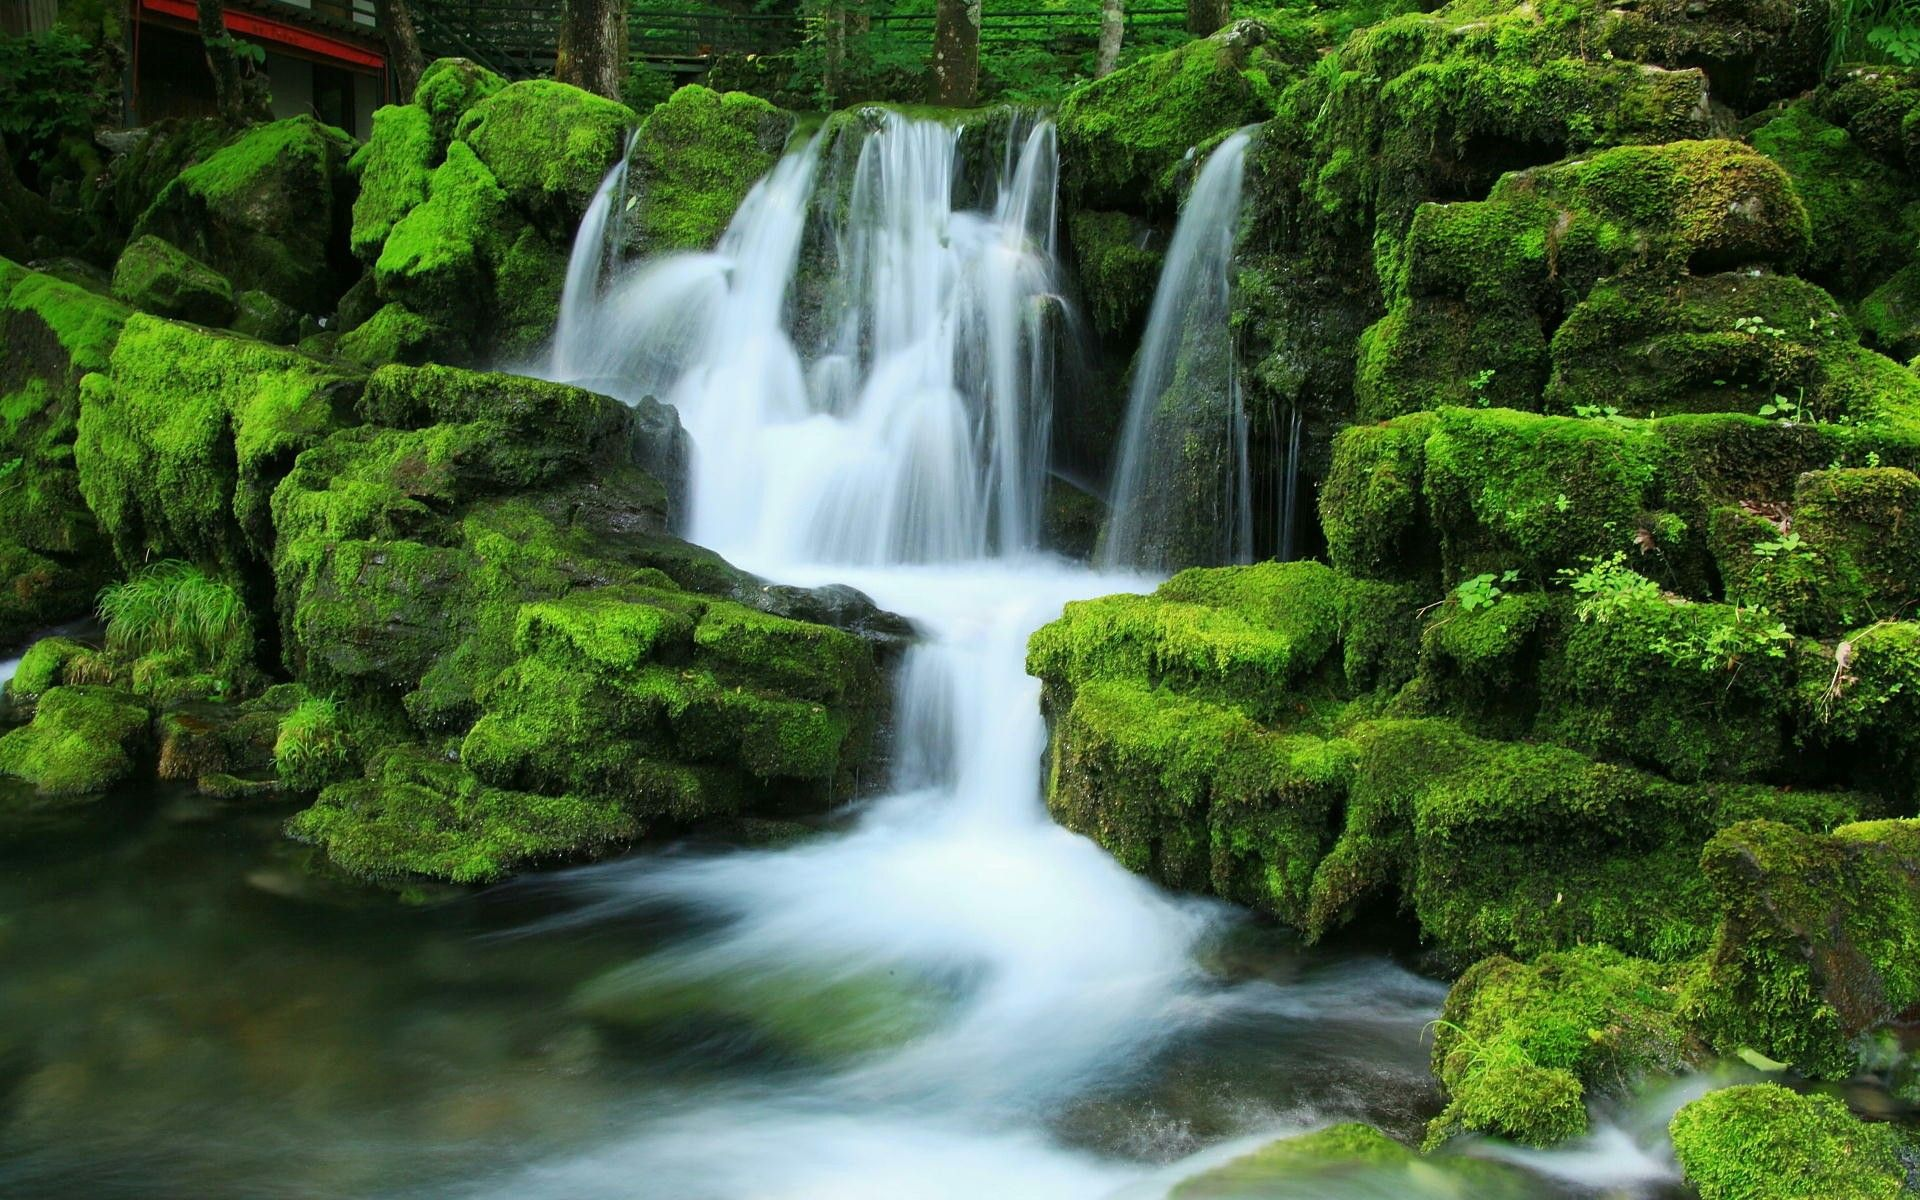 Waterfall Wallpaper 12506 1920x1200 Px Freewallsource Com Waterfall Wallpaper Waterfall Waterfall Photo